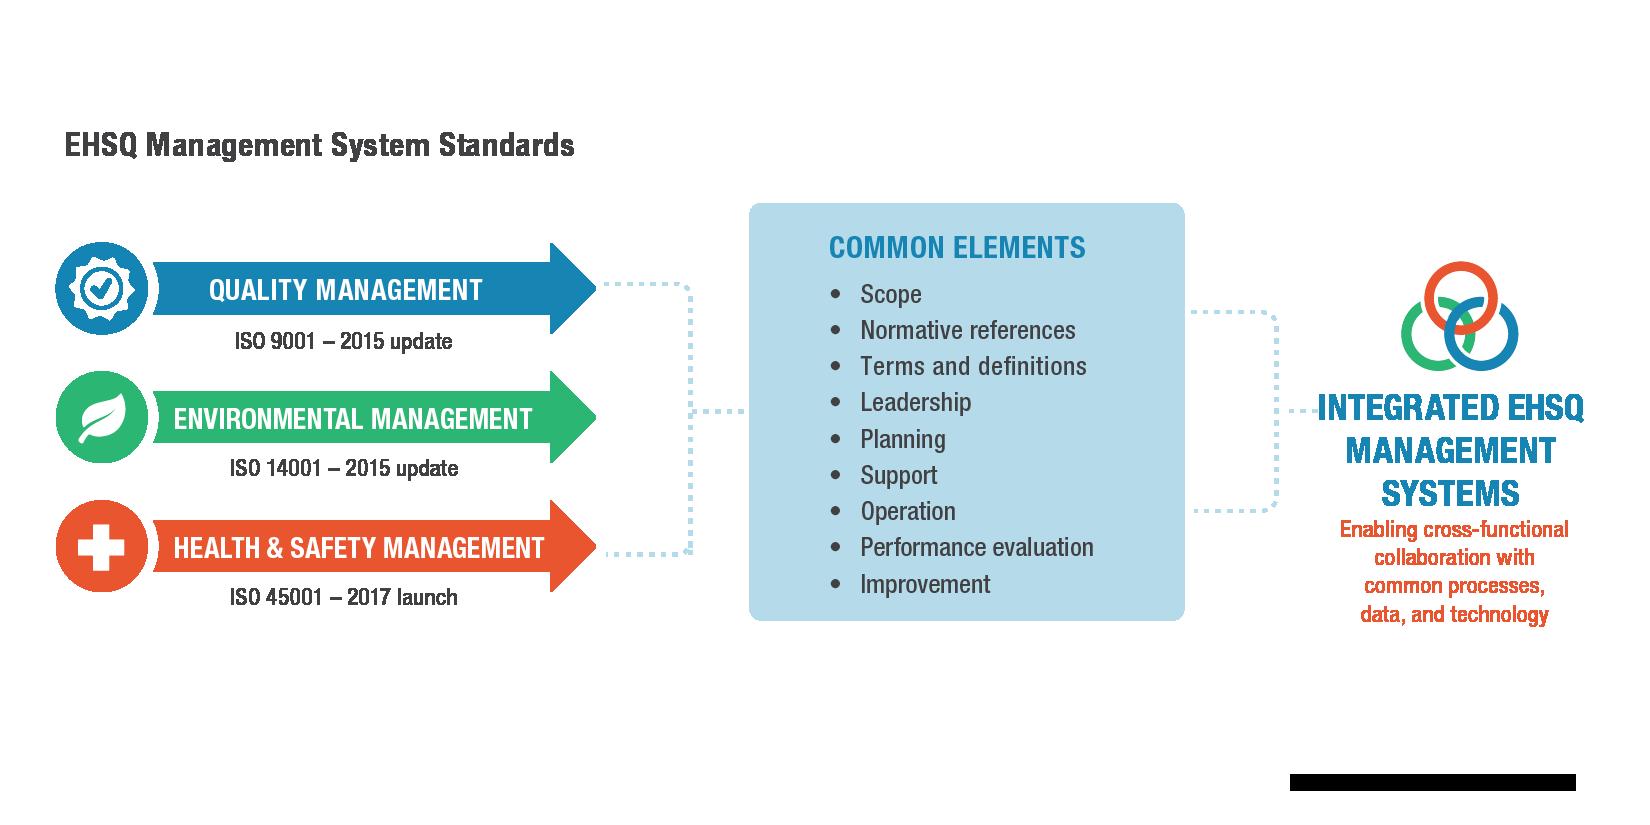 EHSQ Management Systems Common Elements